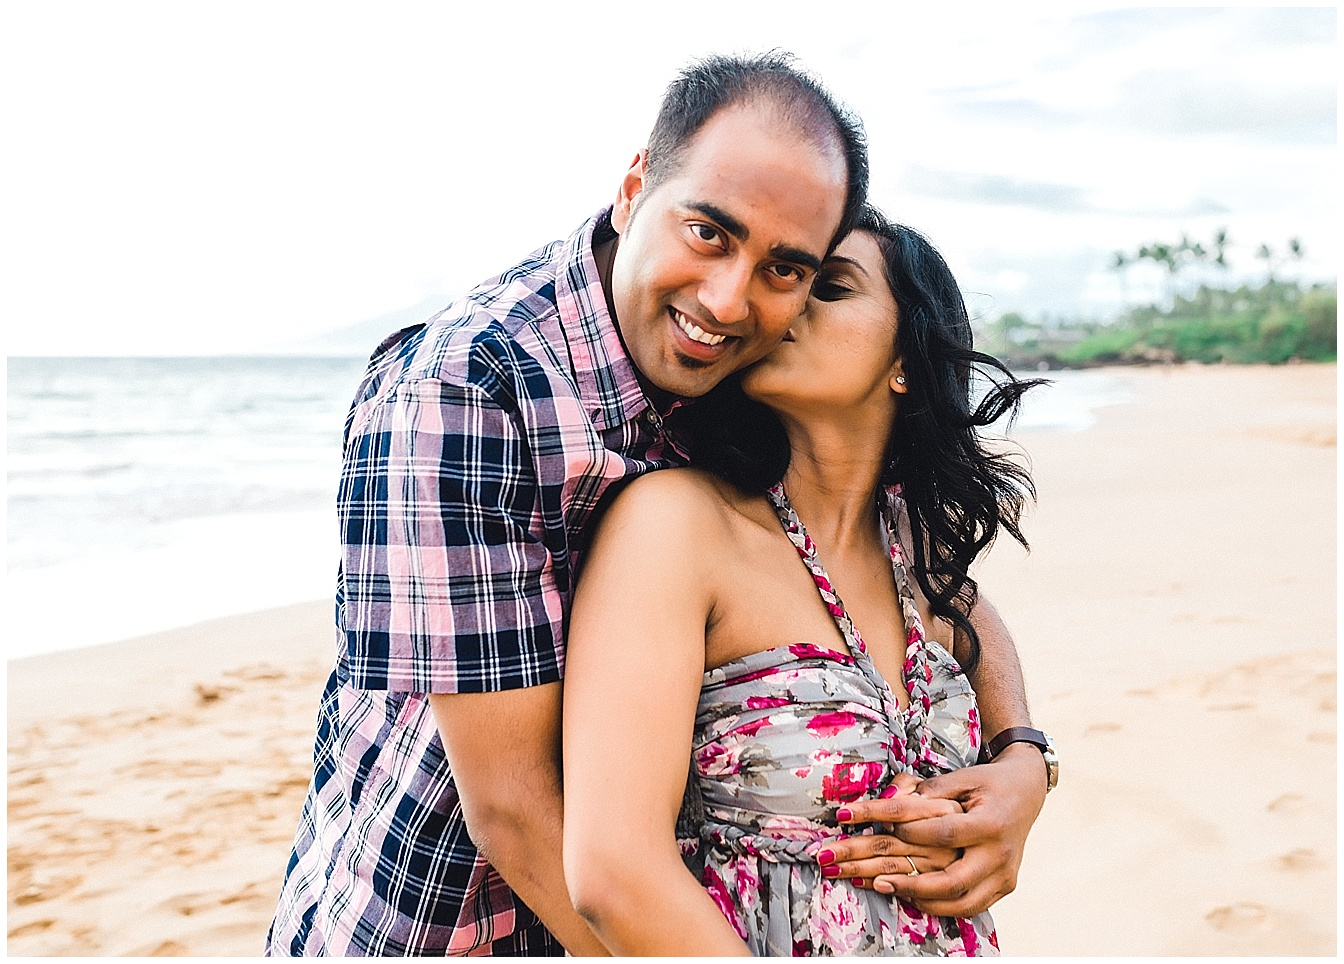 Pooja + Ashwin | Maternity Session on Maui's South Shore